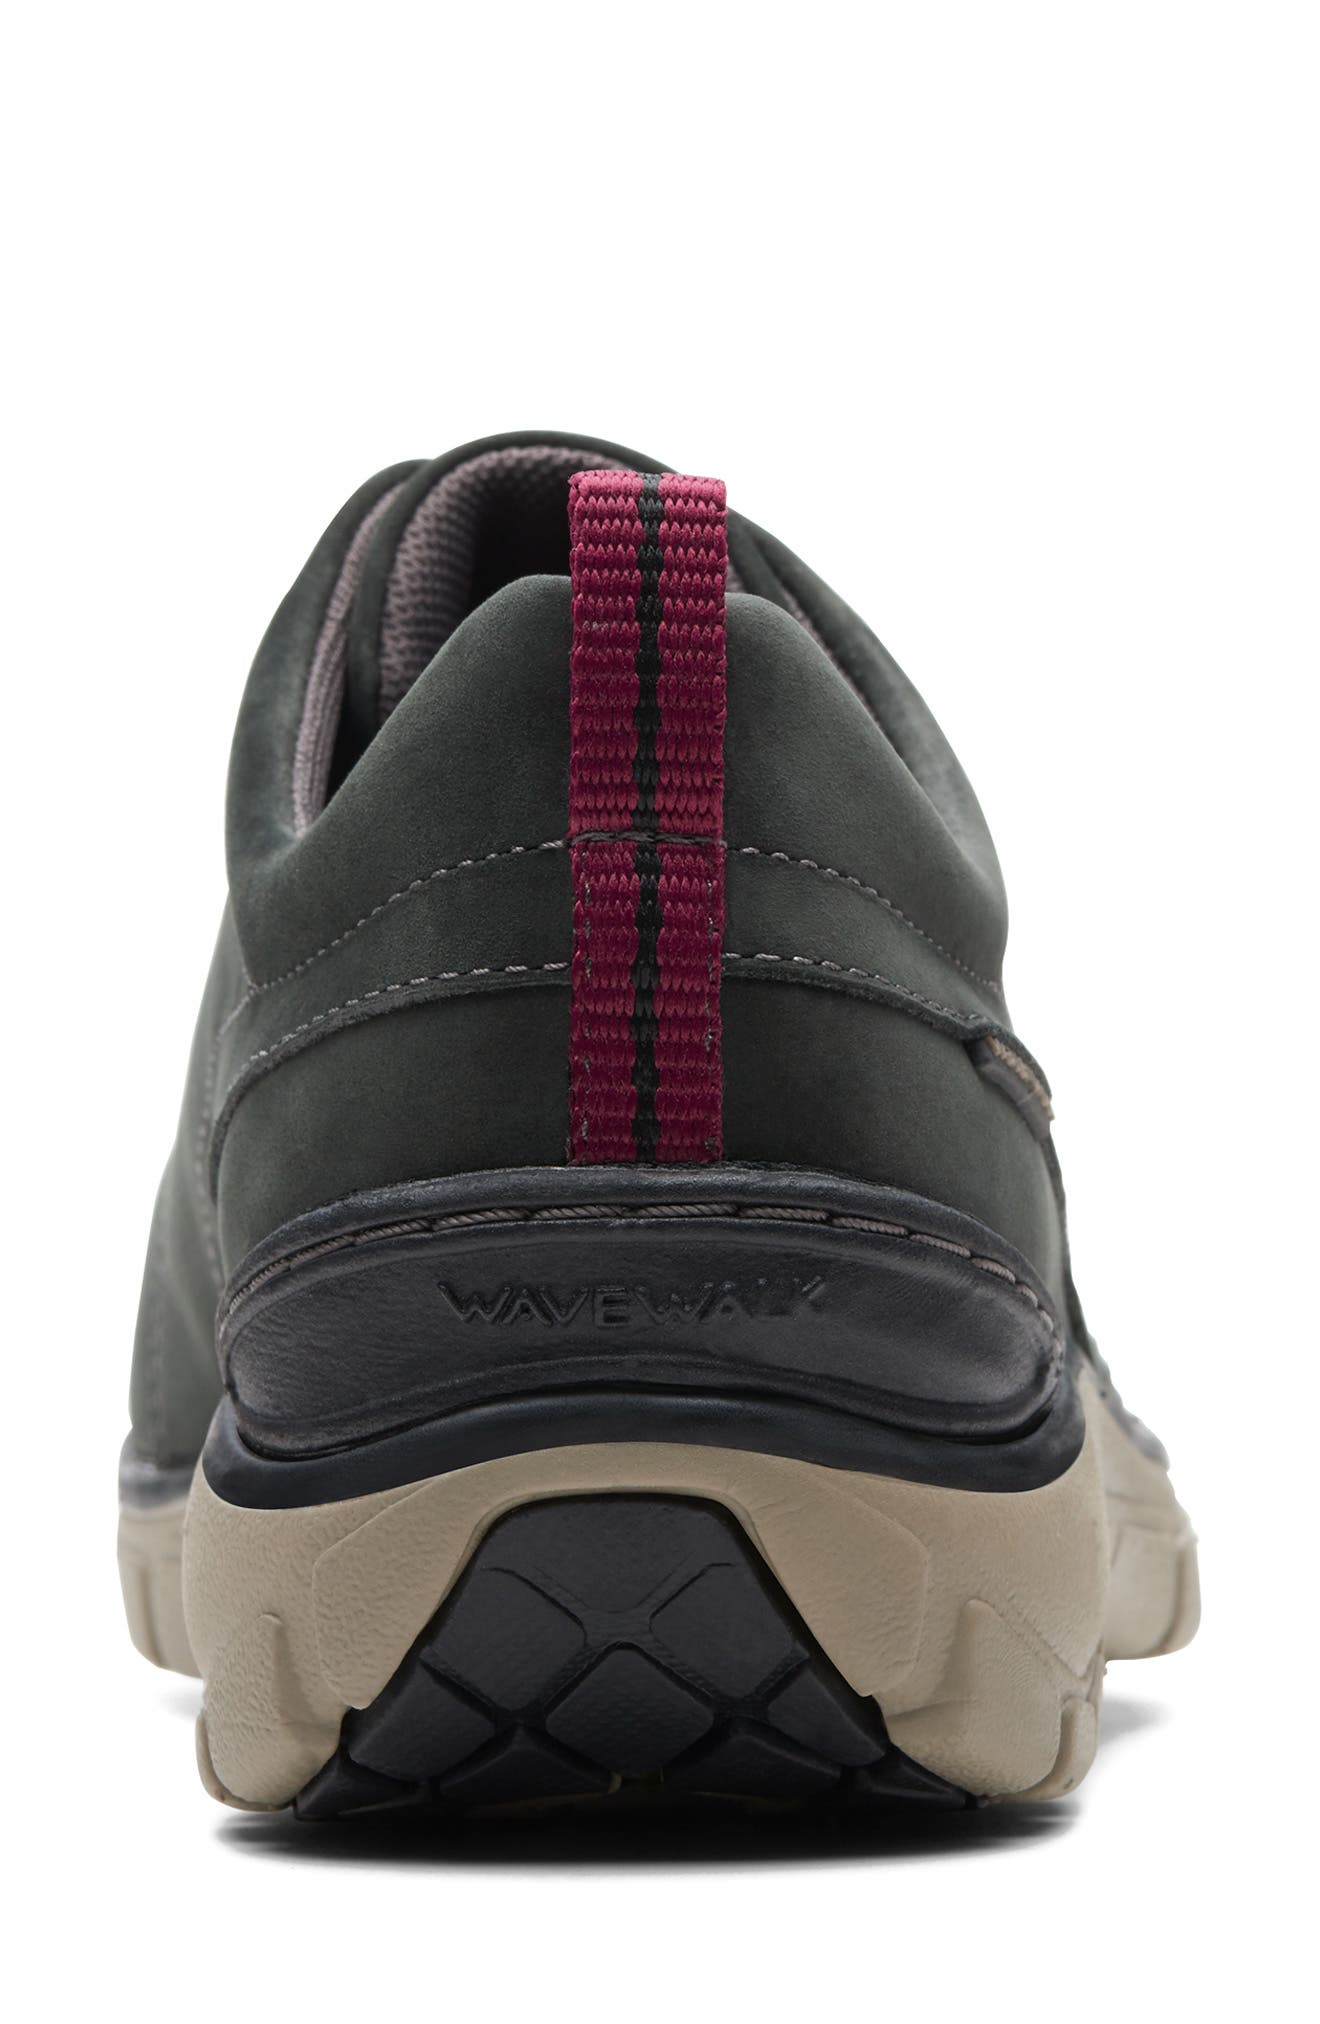 ,                             Wave Go Waterproof Sneaker,                             Alternate thumbnail 4, color,                             BLACK NUBUCK/ LEATHER COMBI